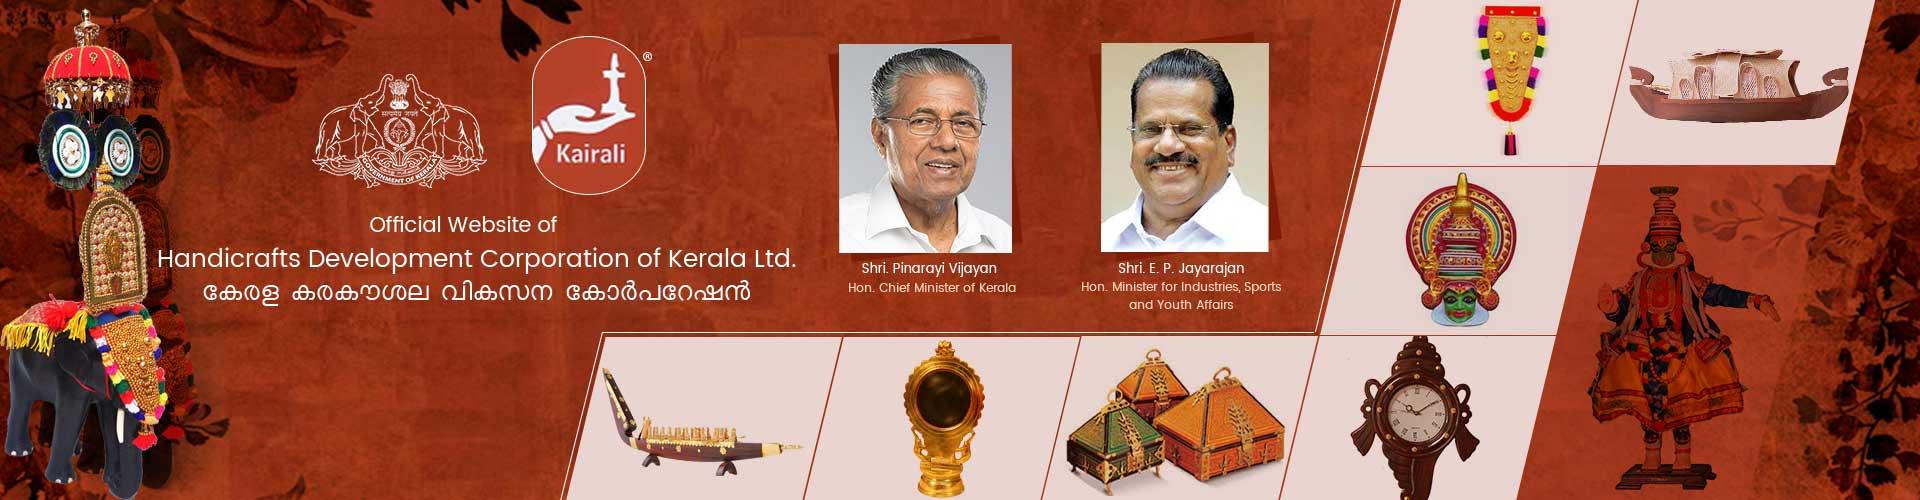 Handicraft Development Corporation